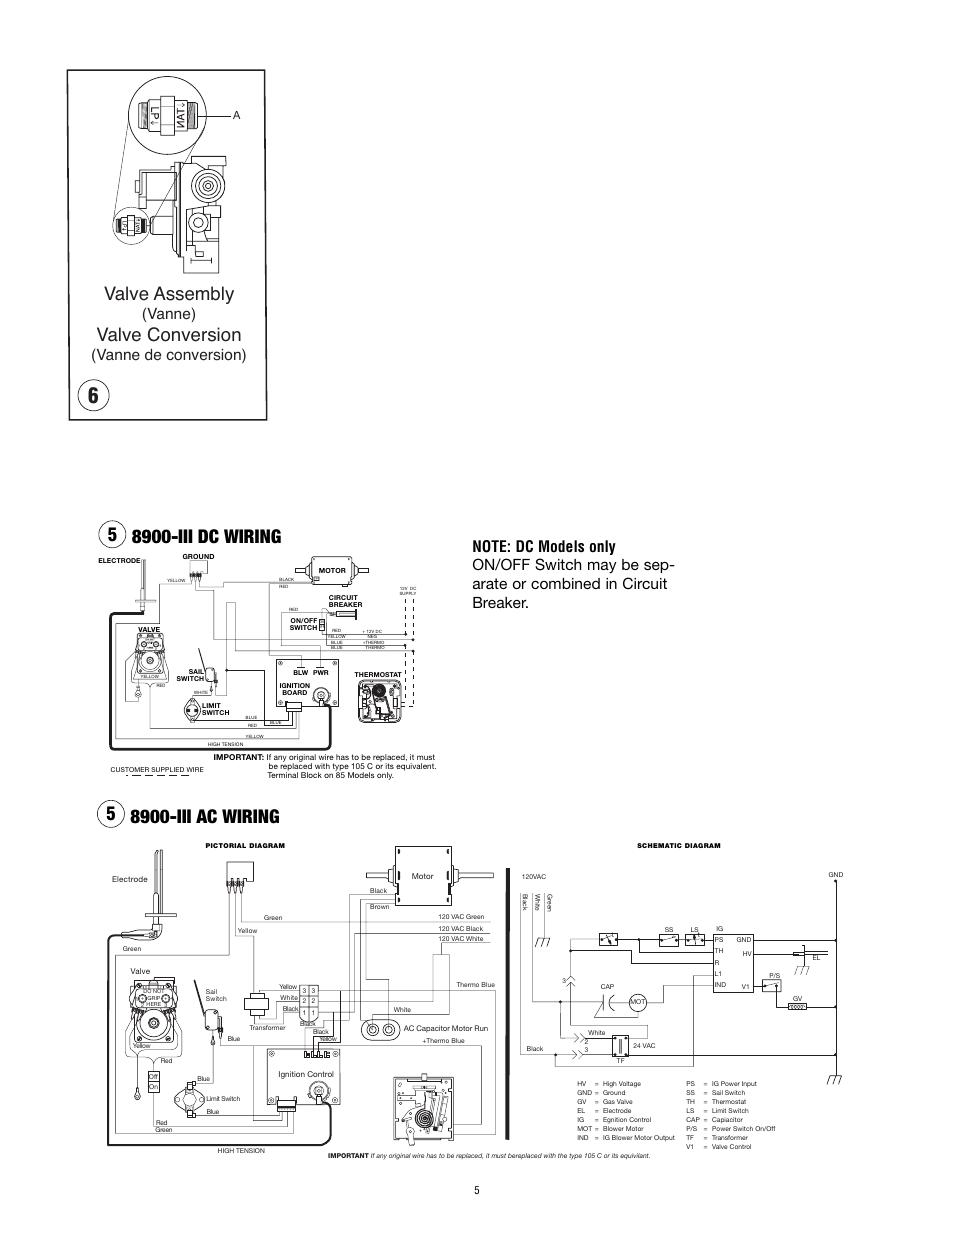 medium resolution of valve assembly valve conversion vanne vanne de conversion atwood mobile